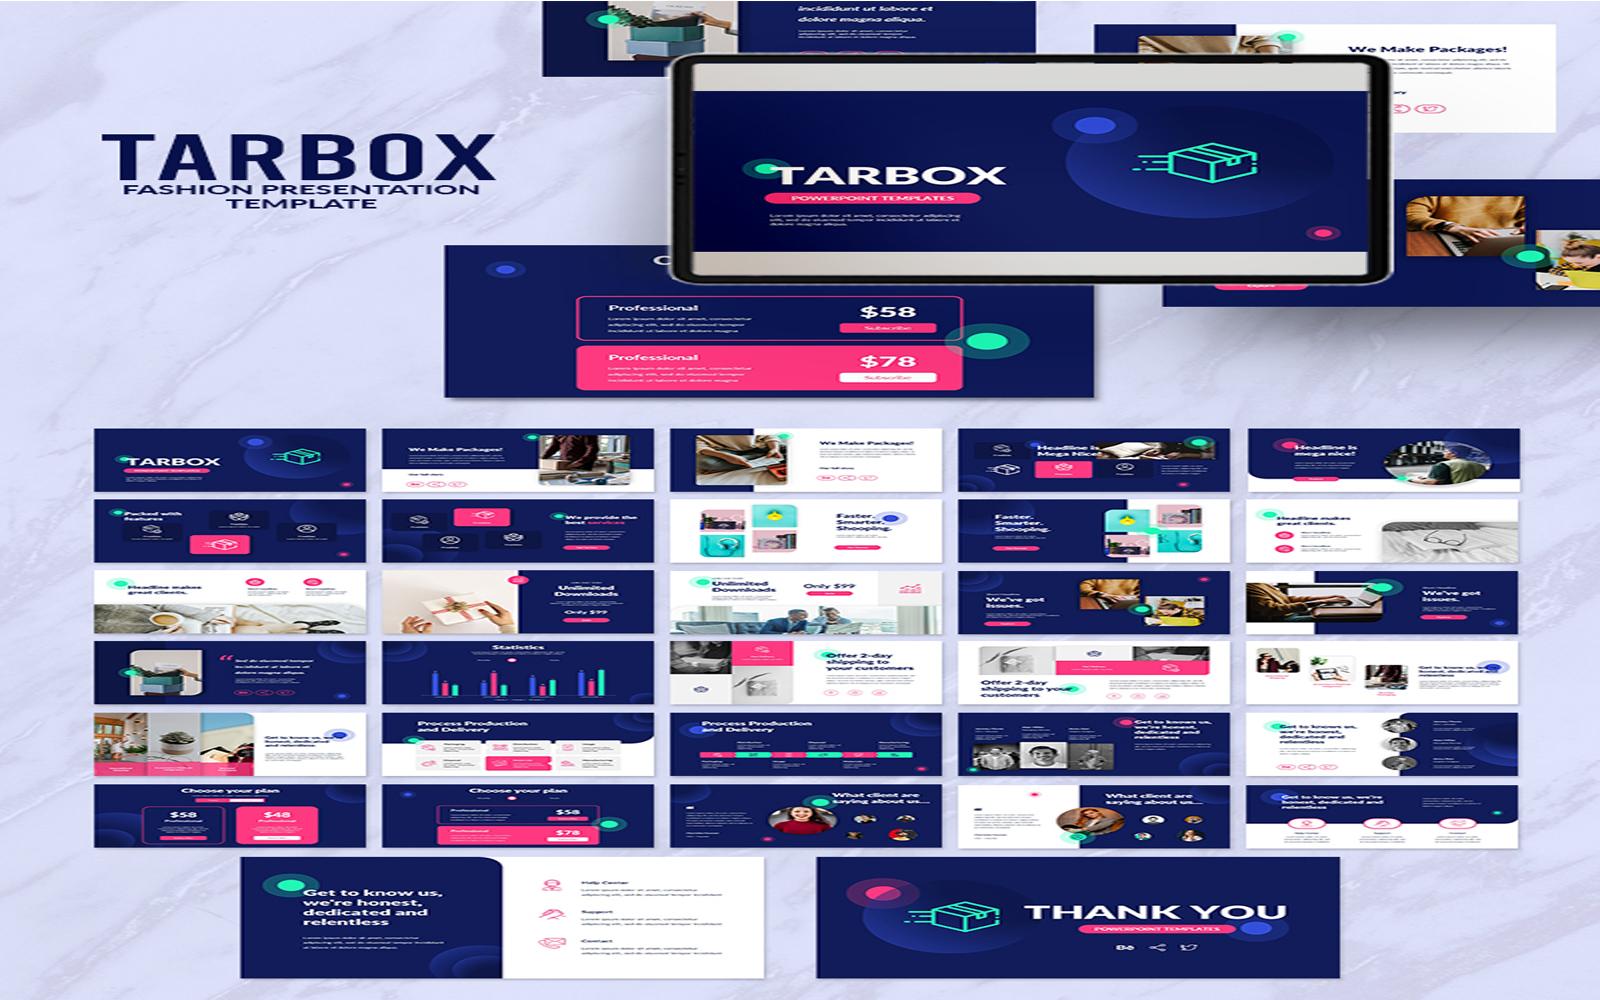 Tarbox Presentation PowerPoint Template